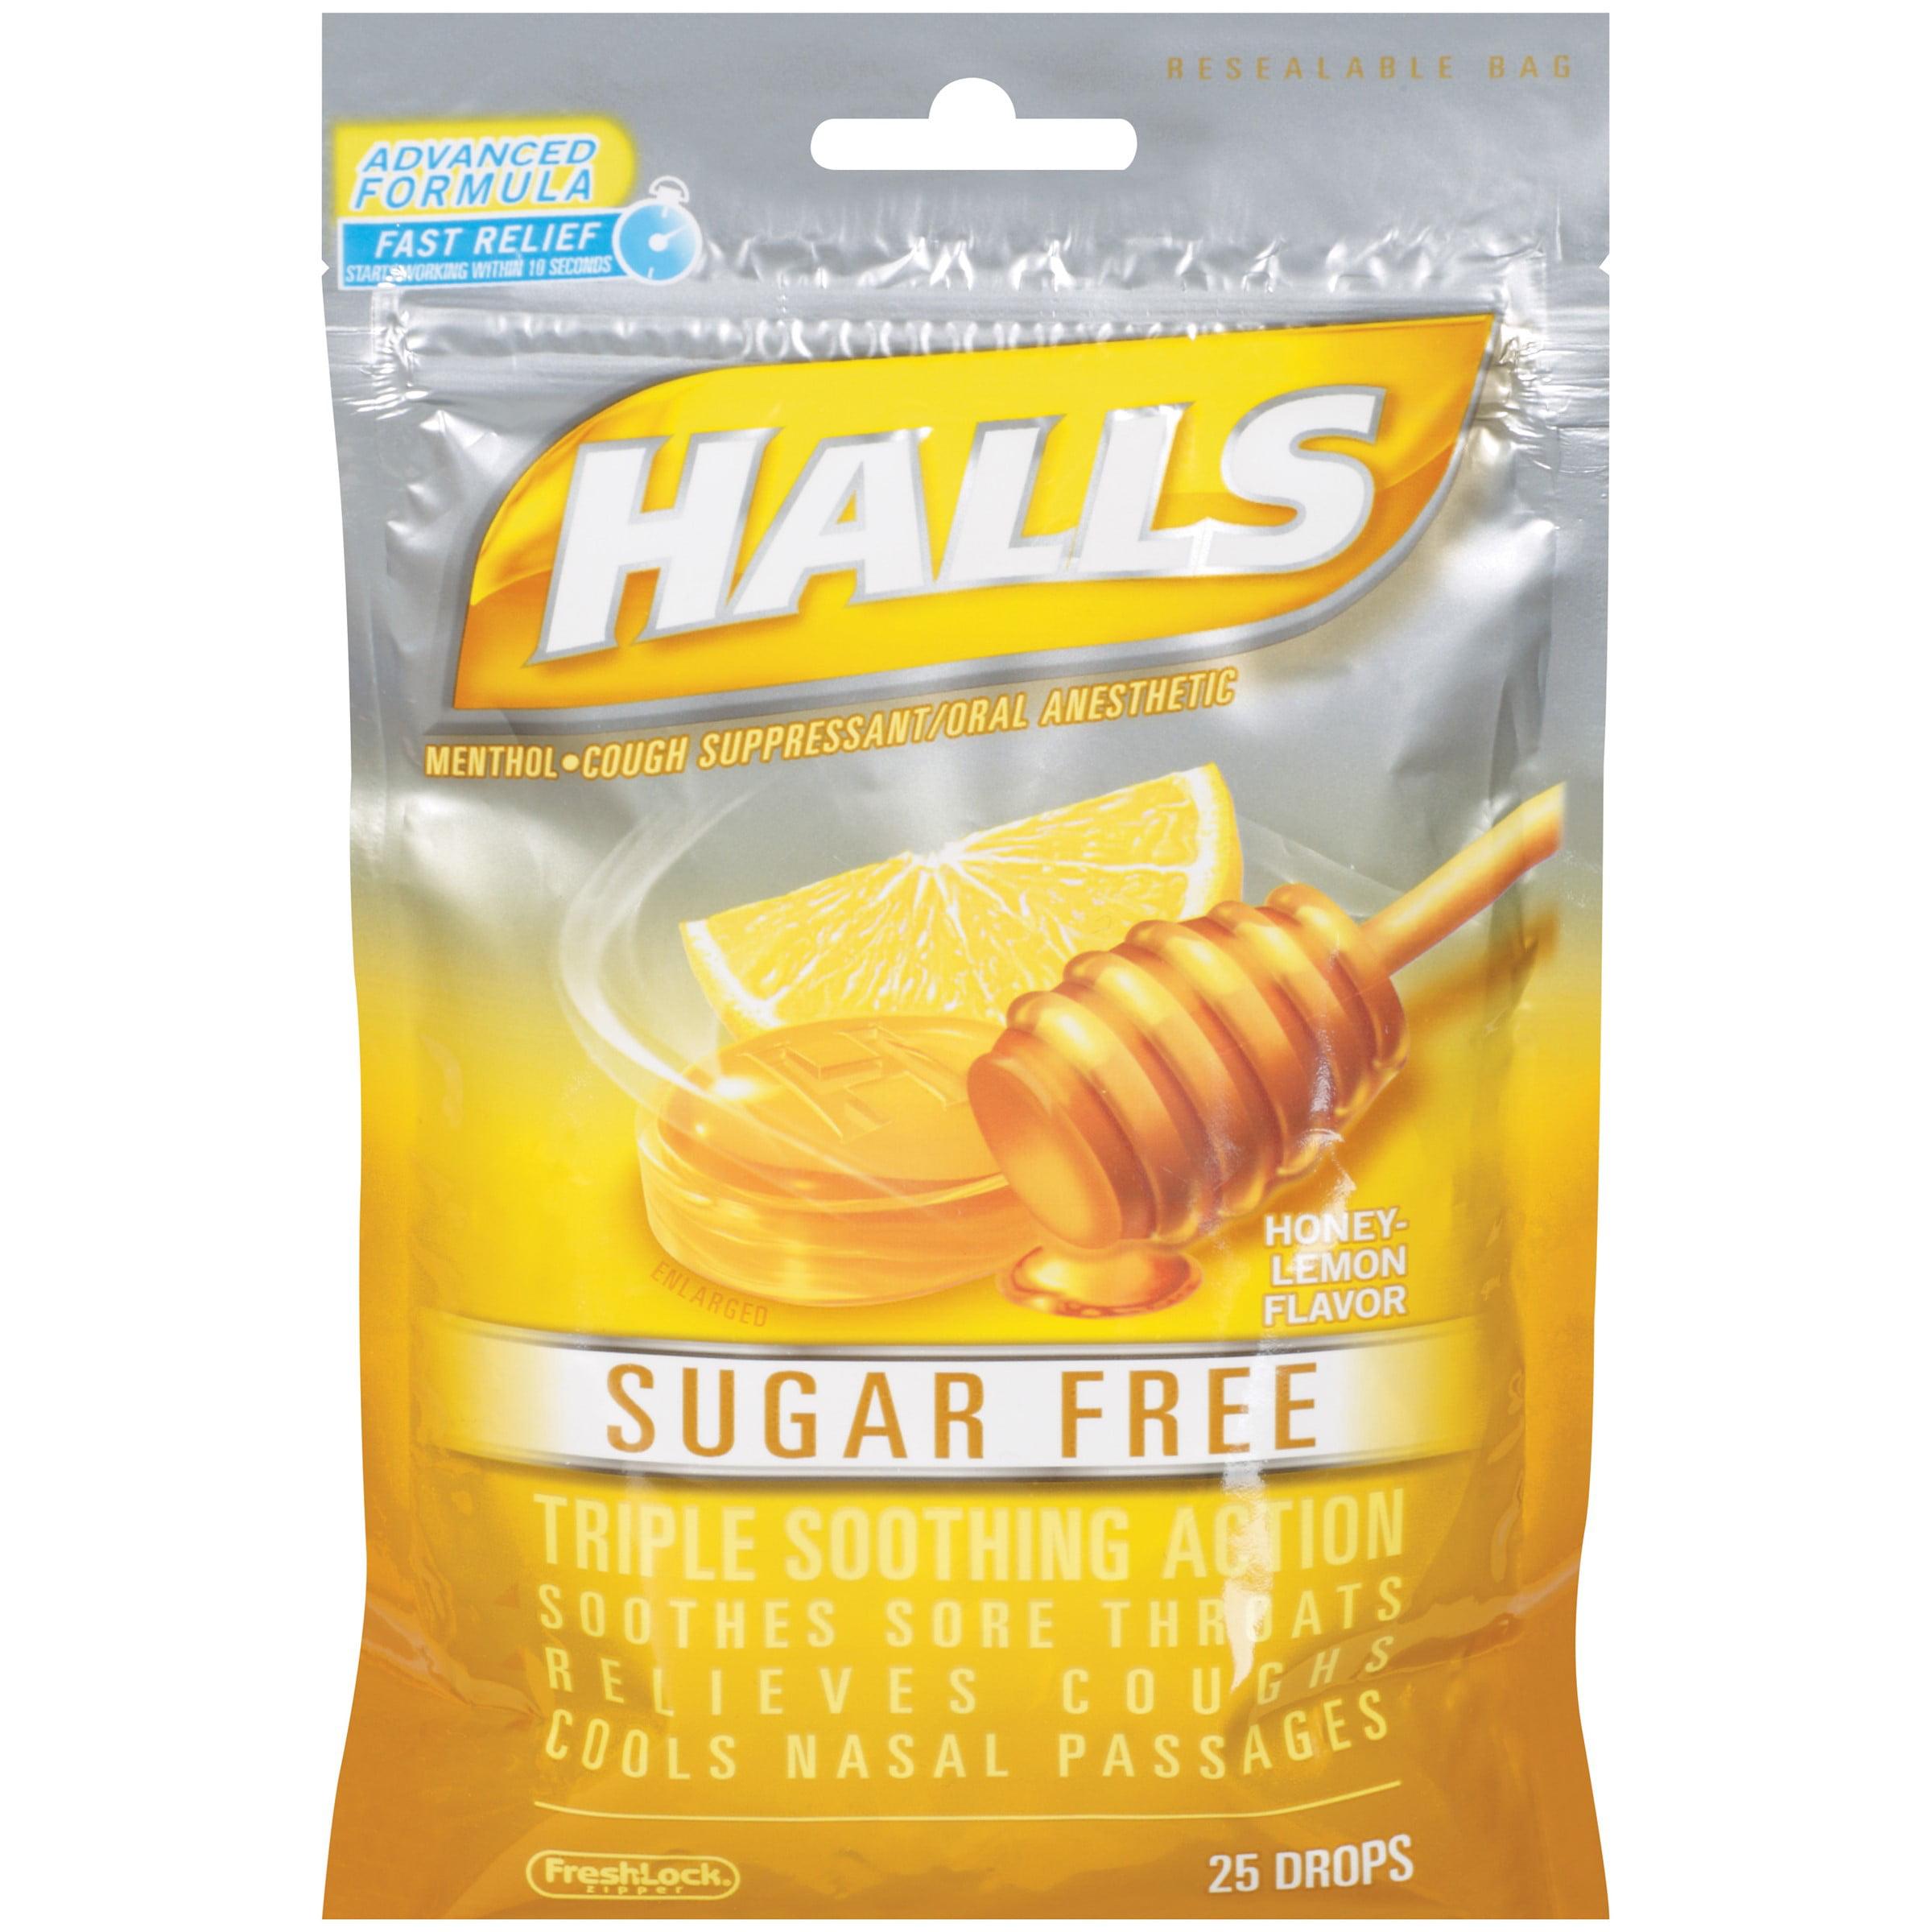 Halls Sugar Free Mentho-Lyptus Cough Suppressant Drops, Honey Lemon, 25 Ct